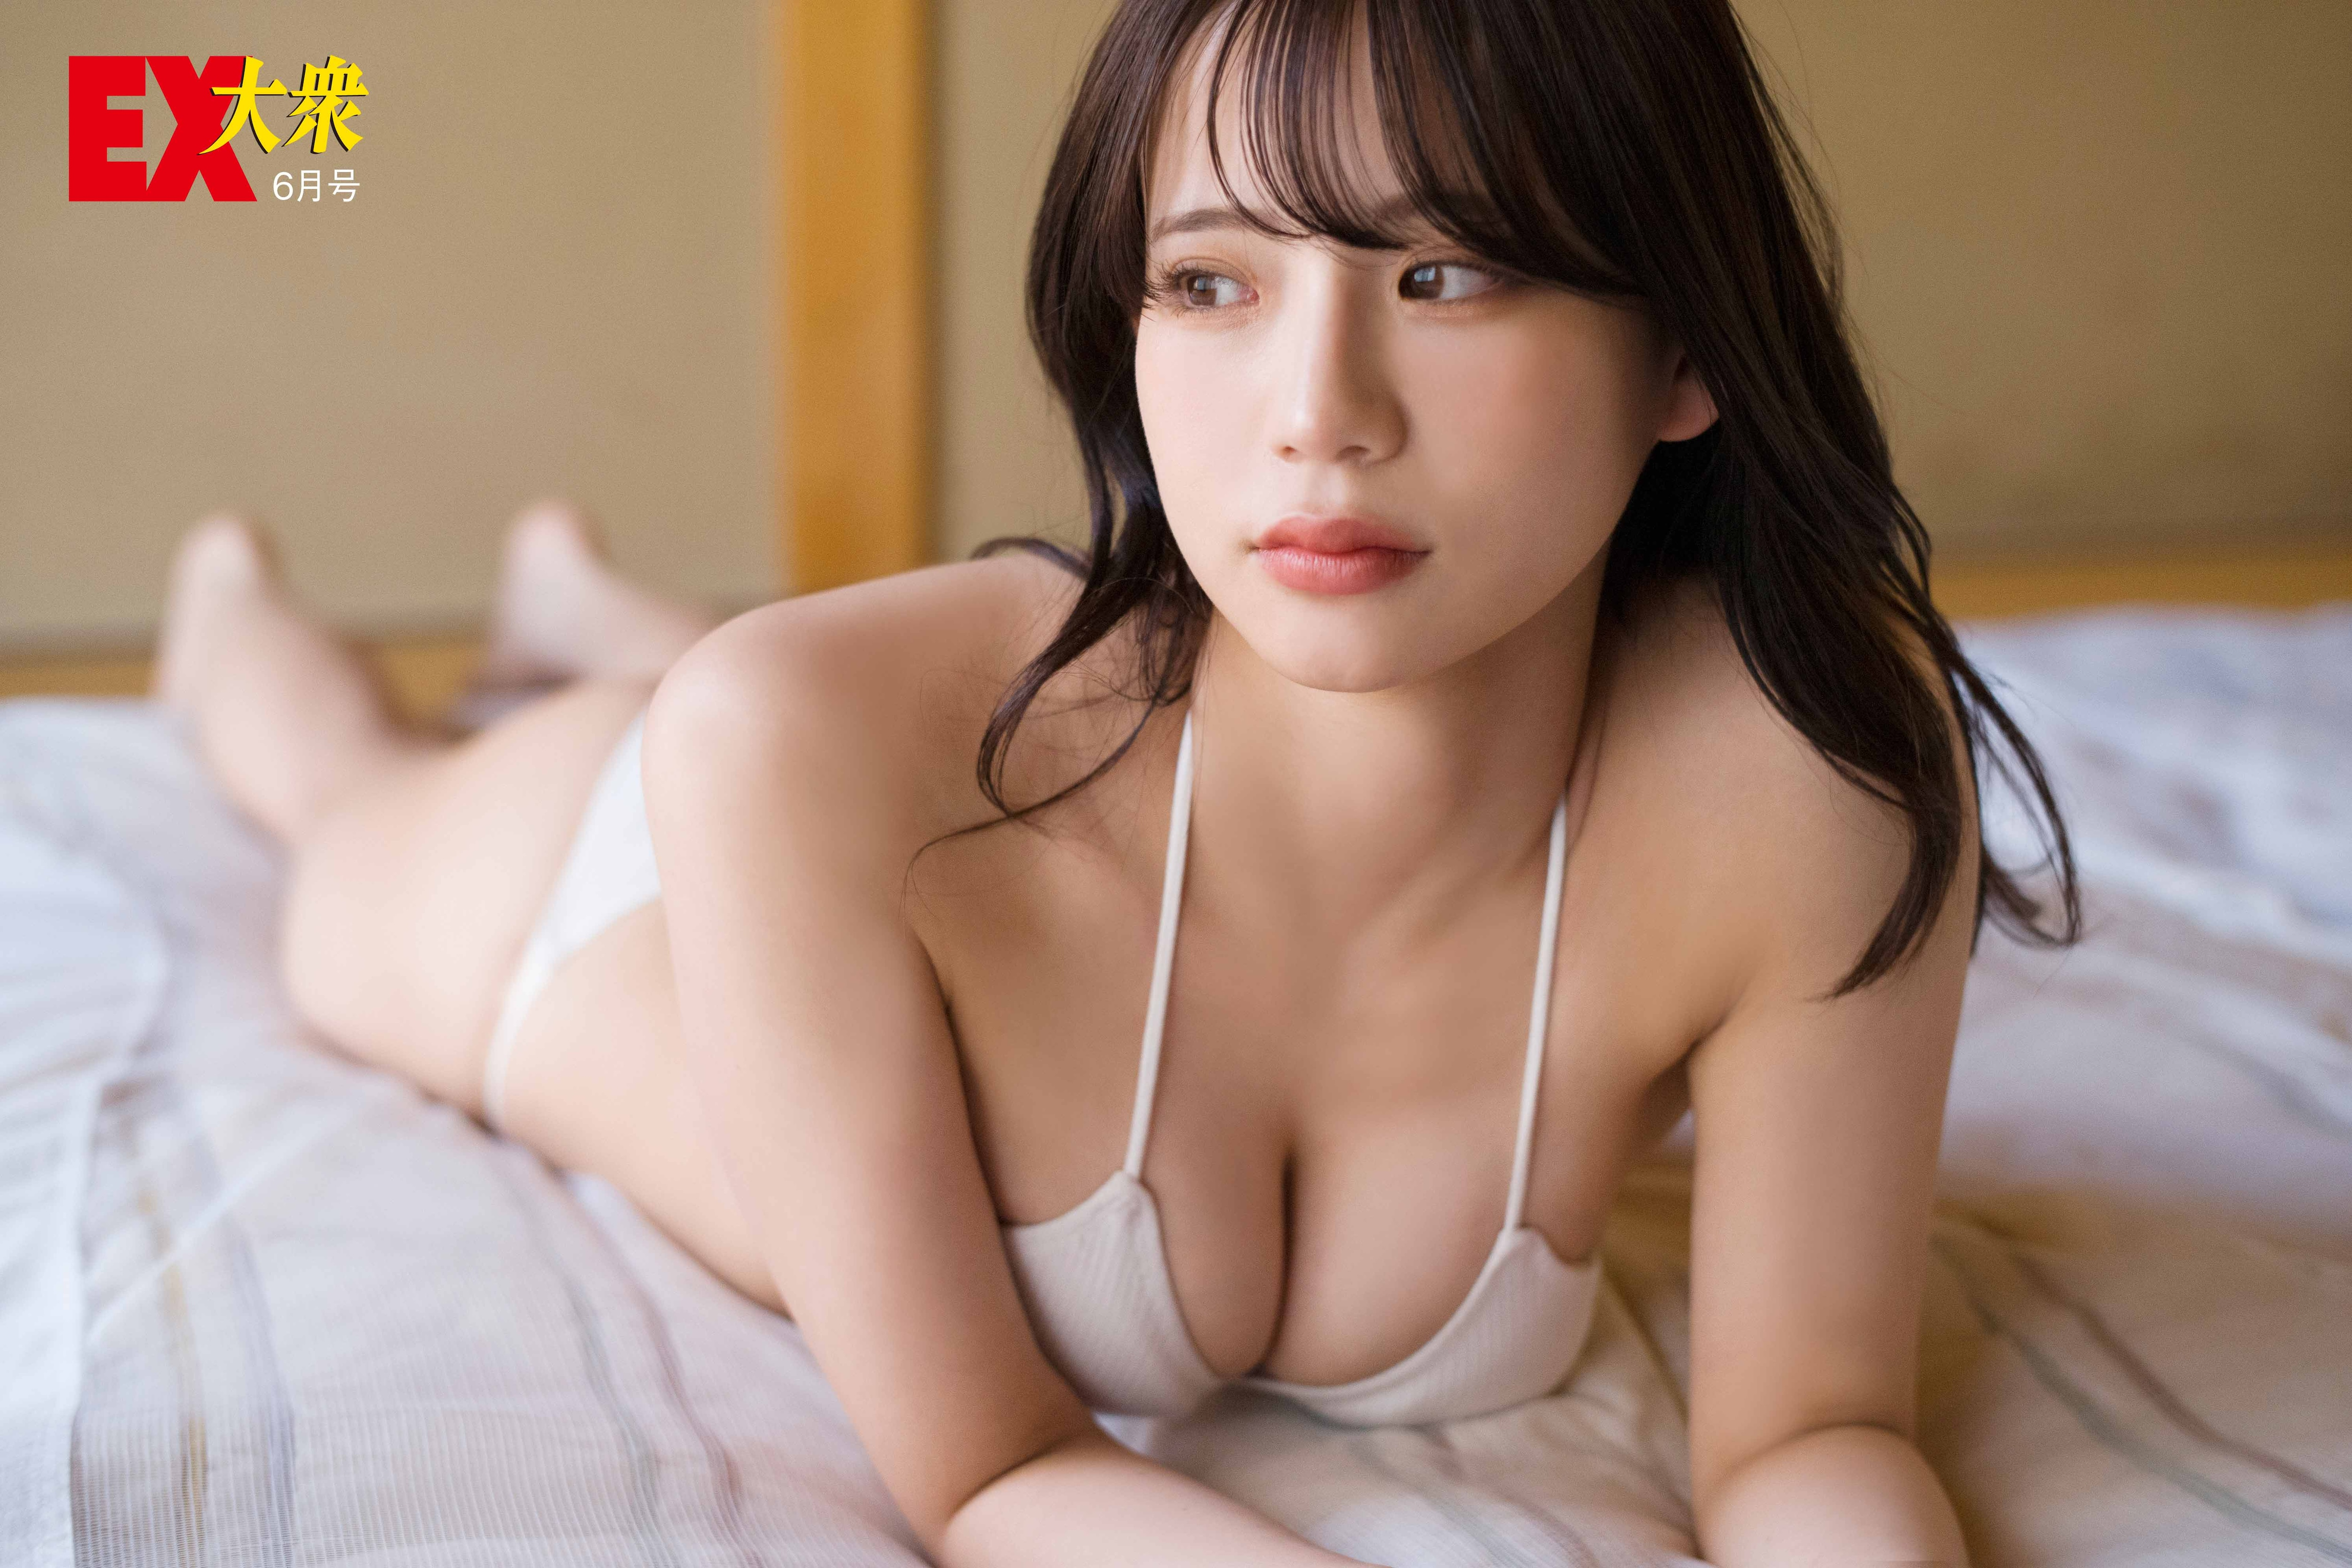 NMB48和田海佑の本誌未掲載カット5枚を大公開!【EX大衆6月号】の画像005